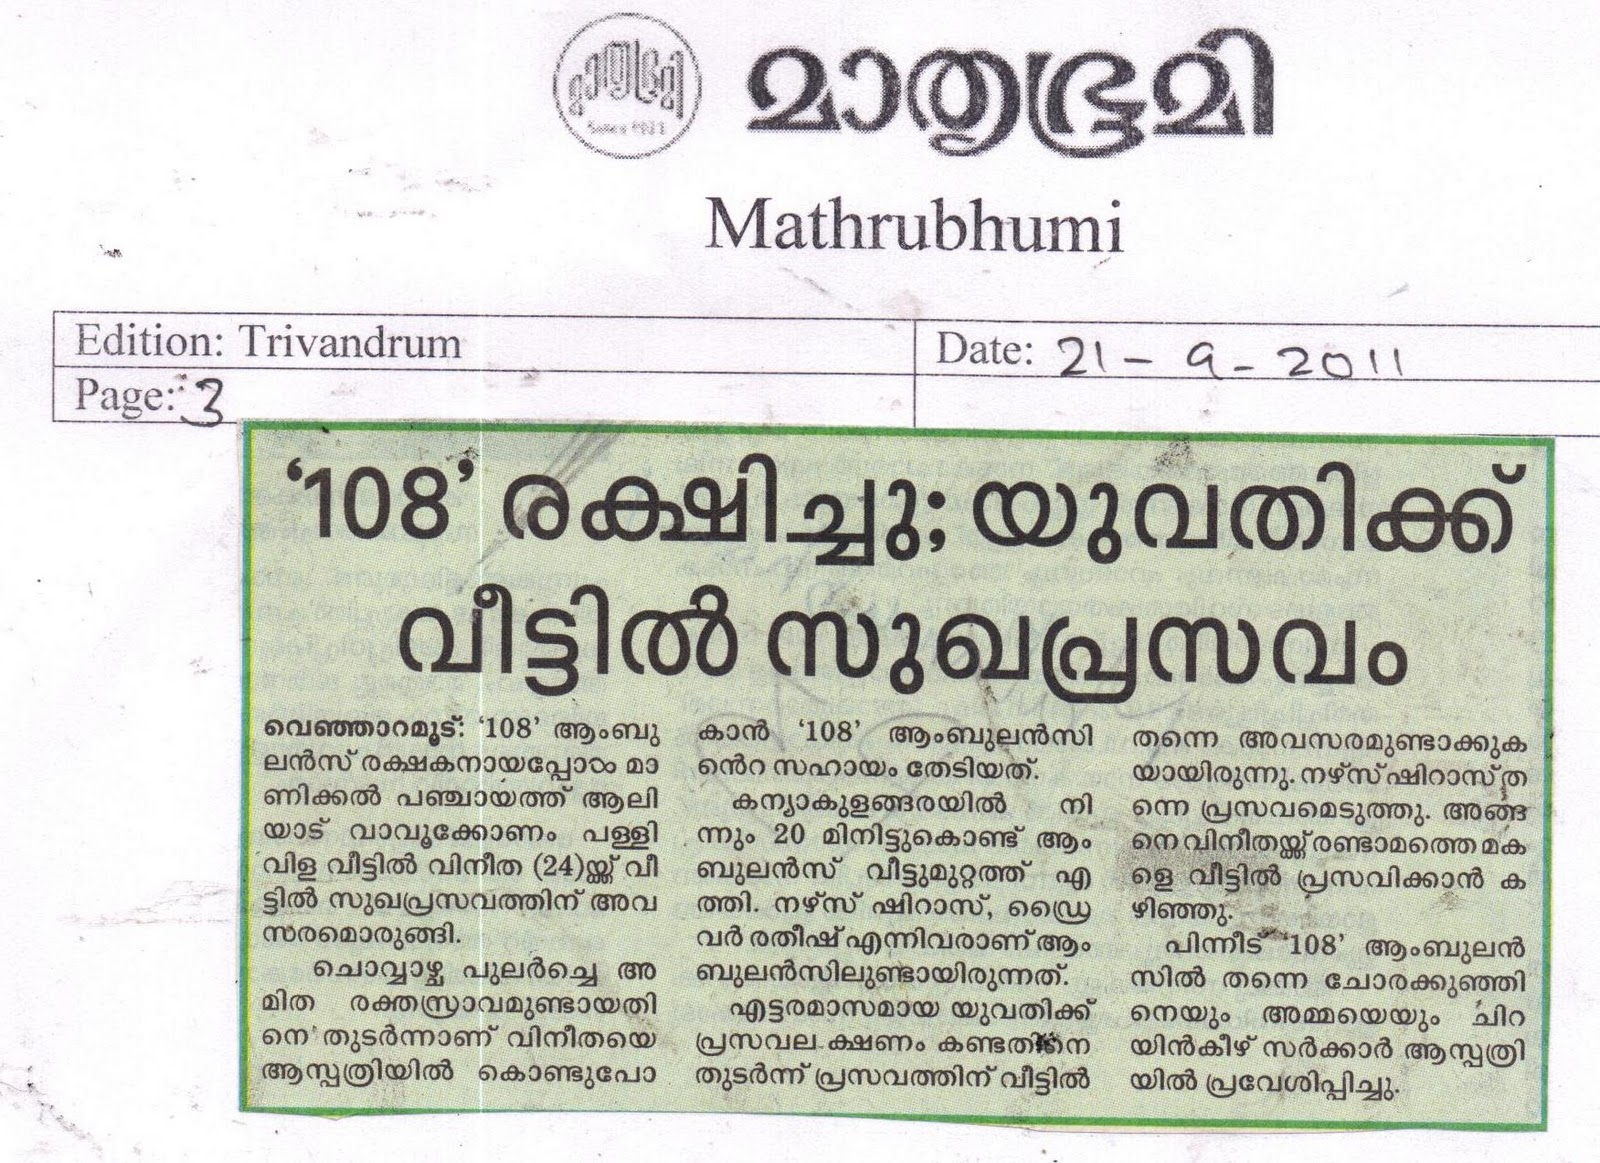 Malayalam Calendar Mathrubhumi 1997 2015 Blank Calendar Free Print